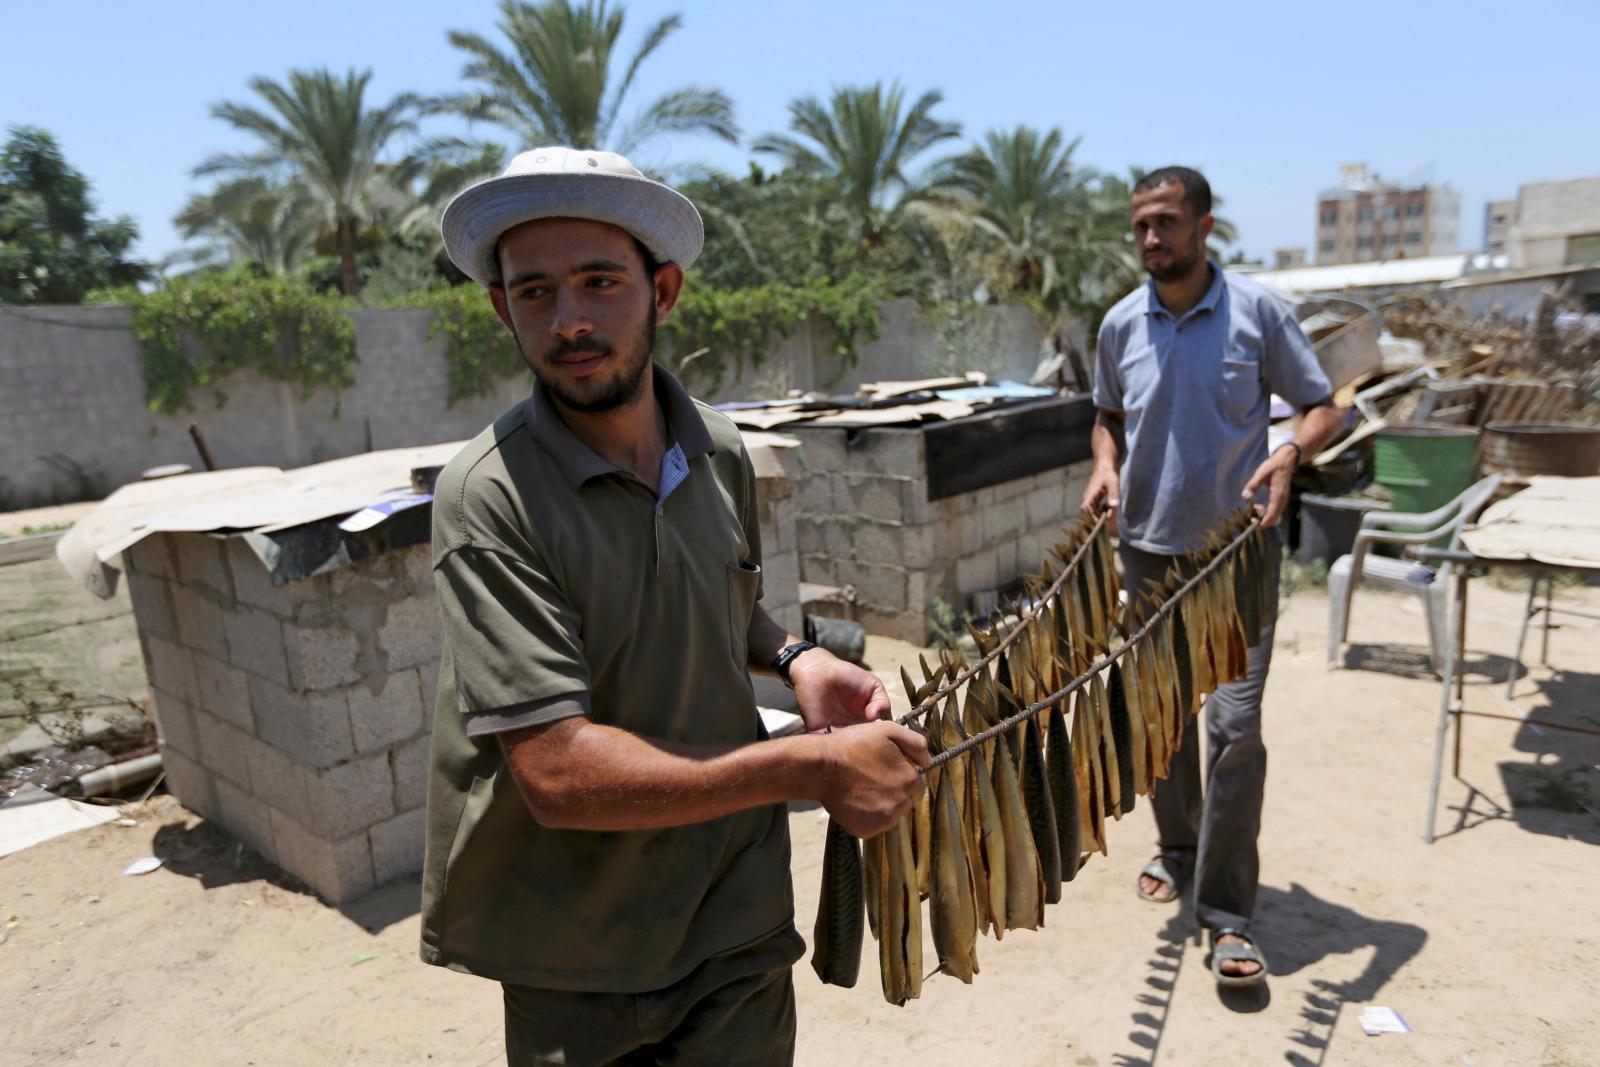 Cool Gaza Eid Al-Fitr 2018 - eid-al-fitr  Pictures_749590 .jpg